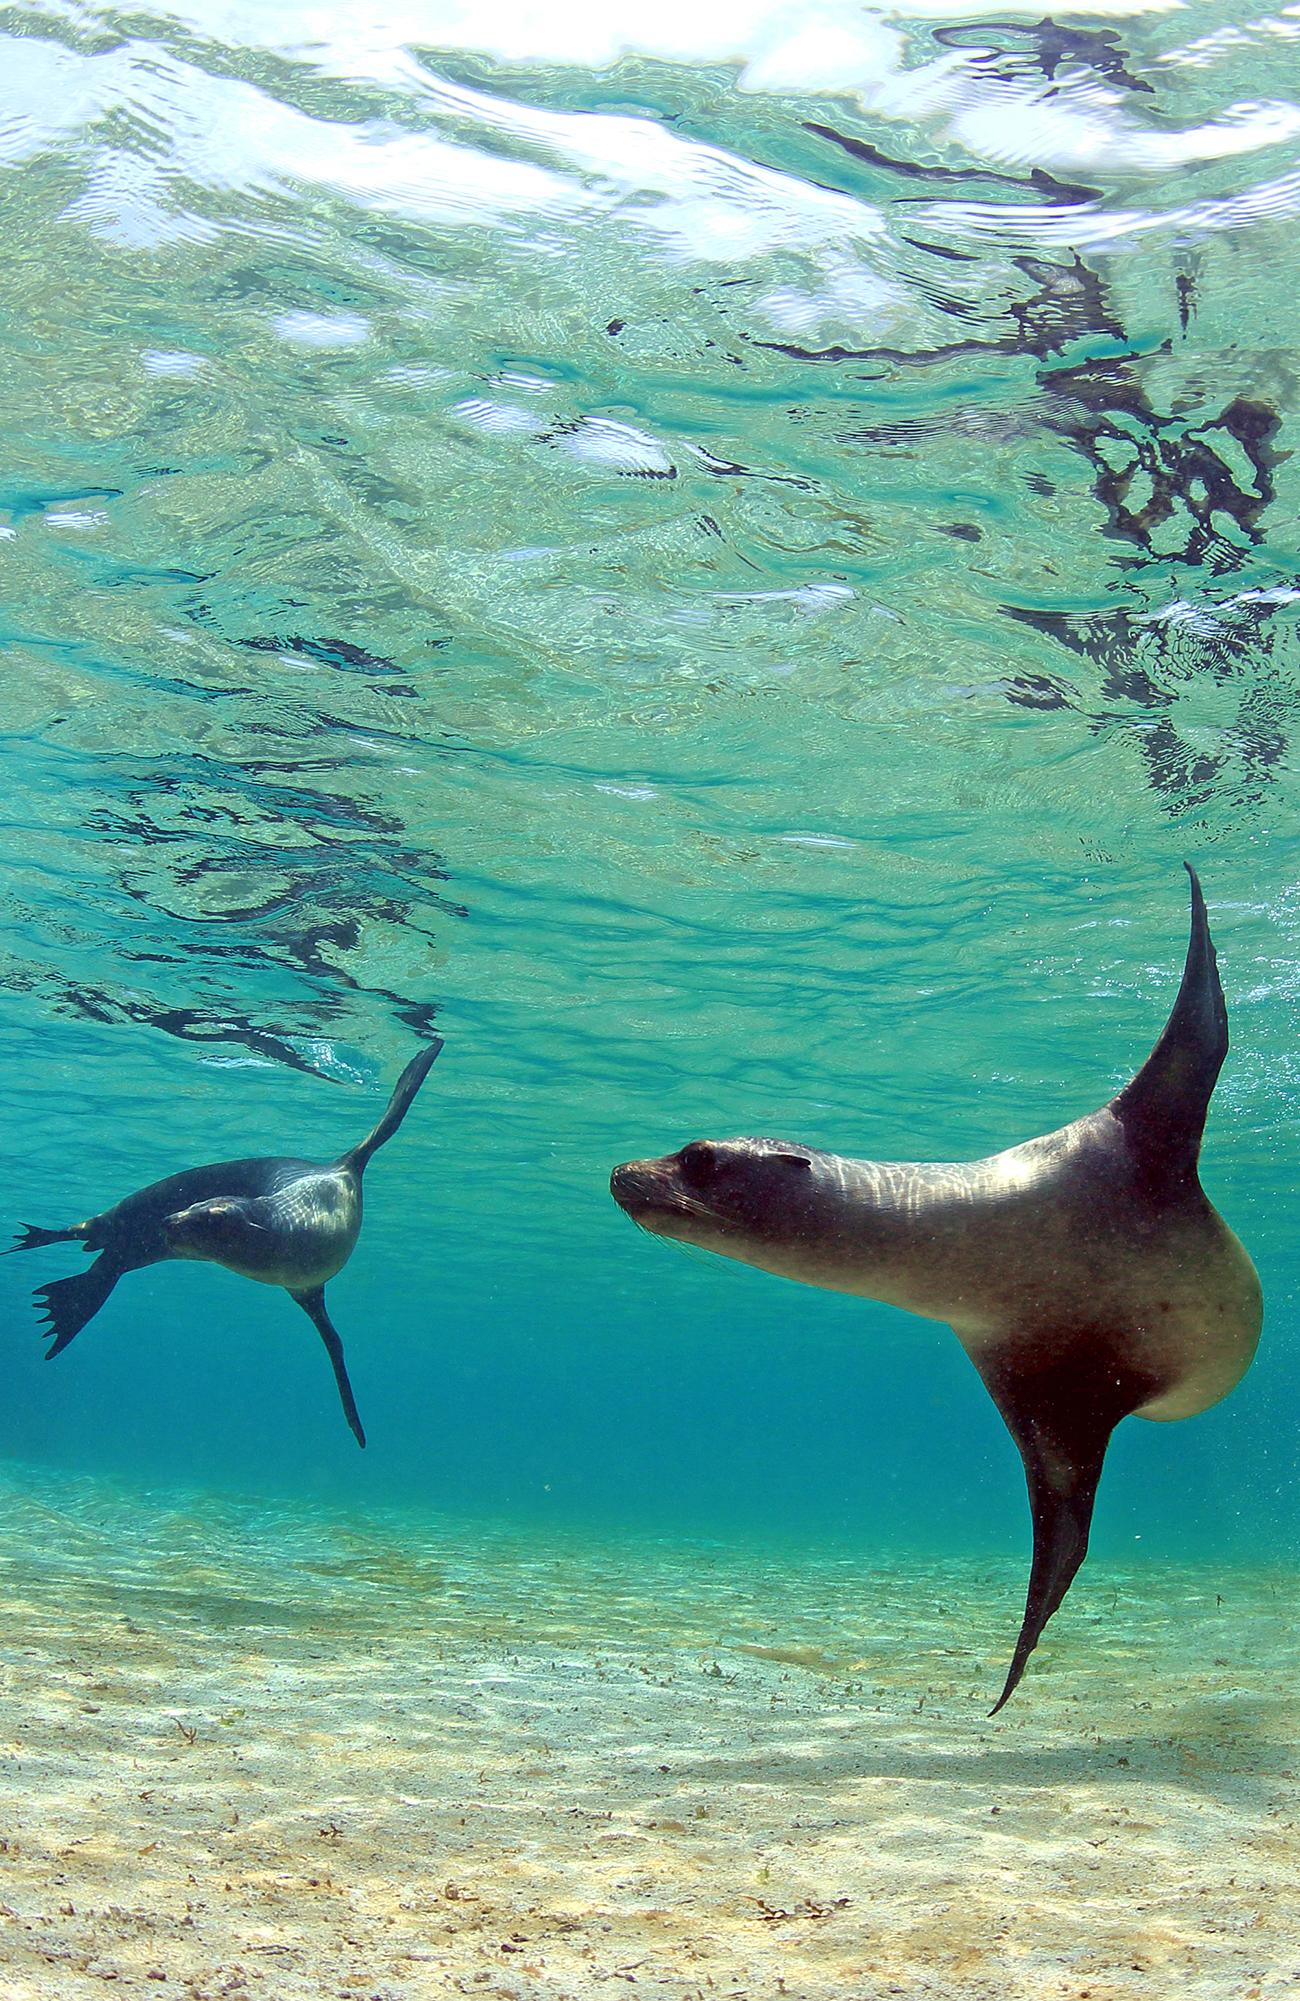 rejser til galapagos